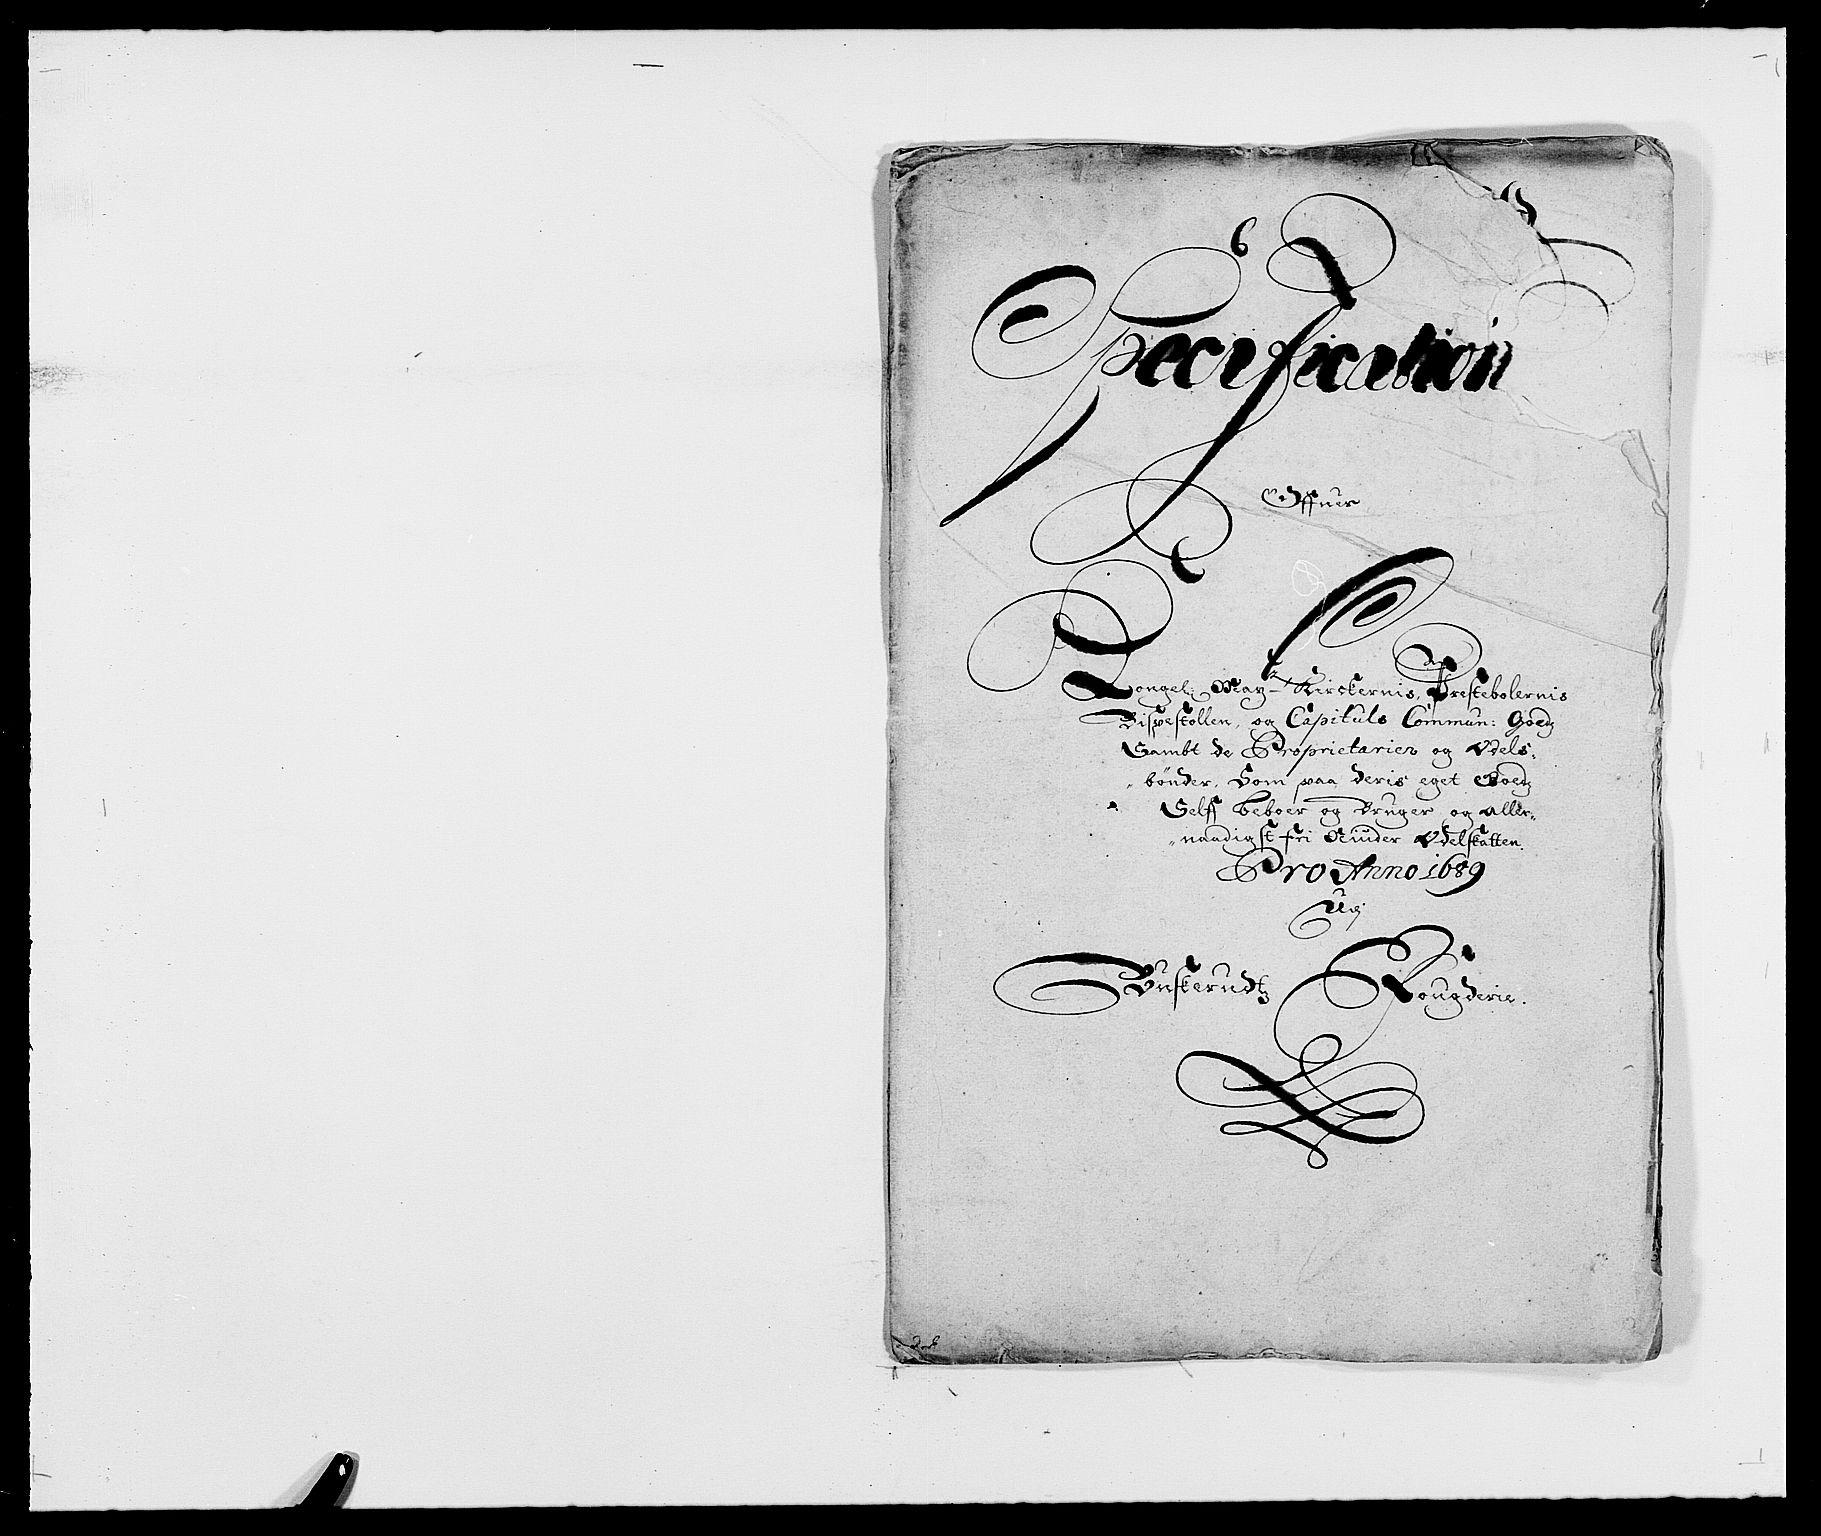 RA, Rentekammeret inntil 1814, Reviderte regnskaper, Fogderegnskap, R25/L1680: Fogderegnskap Buskerud, 1689-1690, s. 244